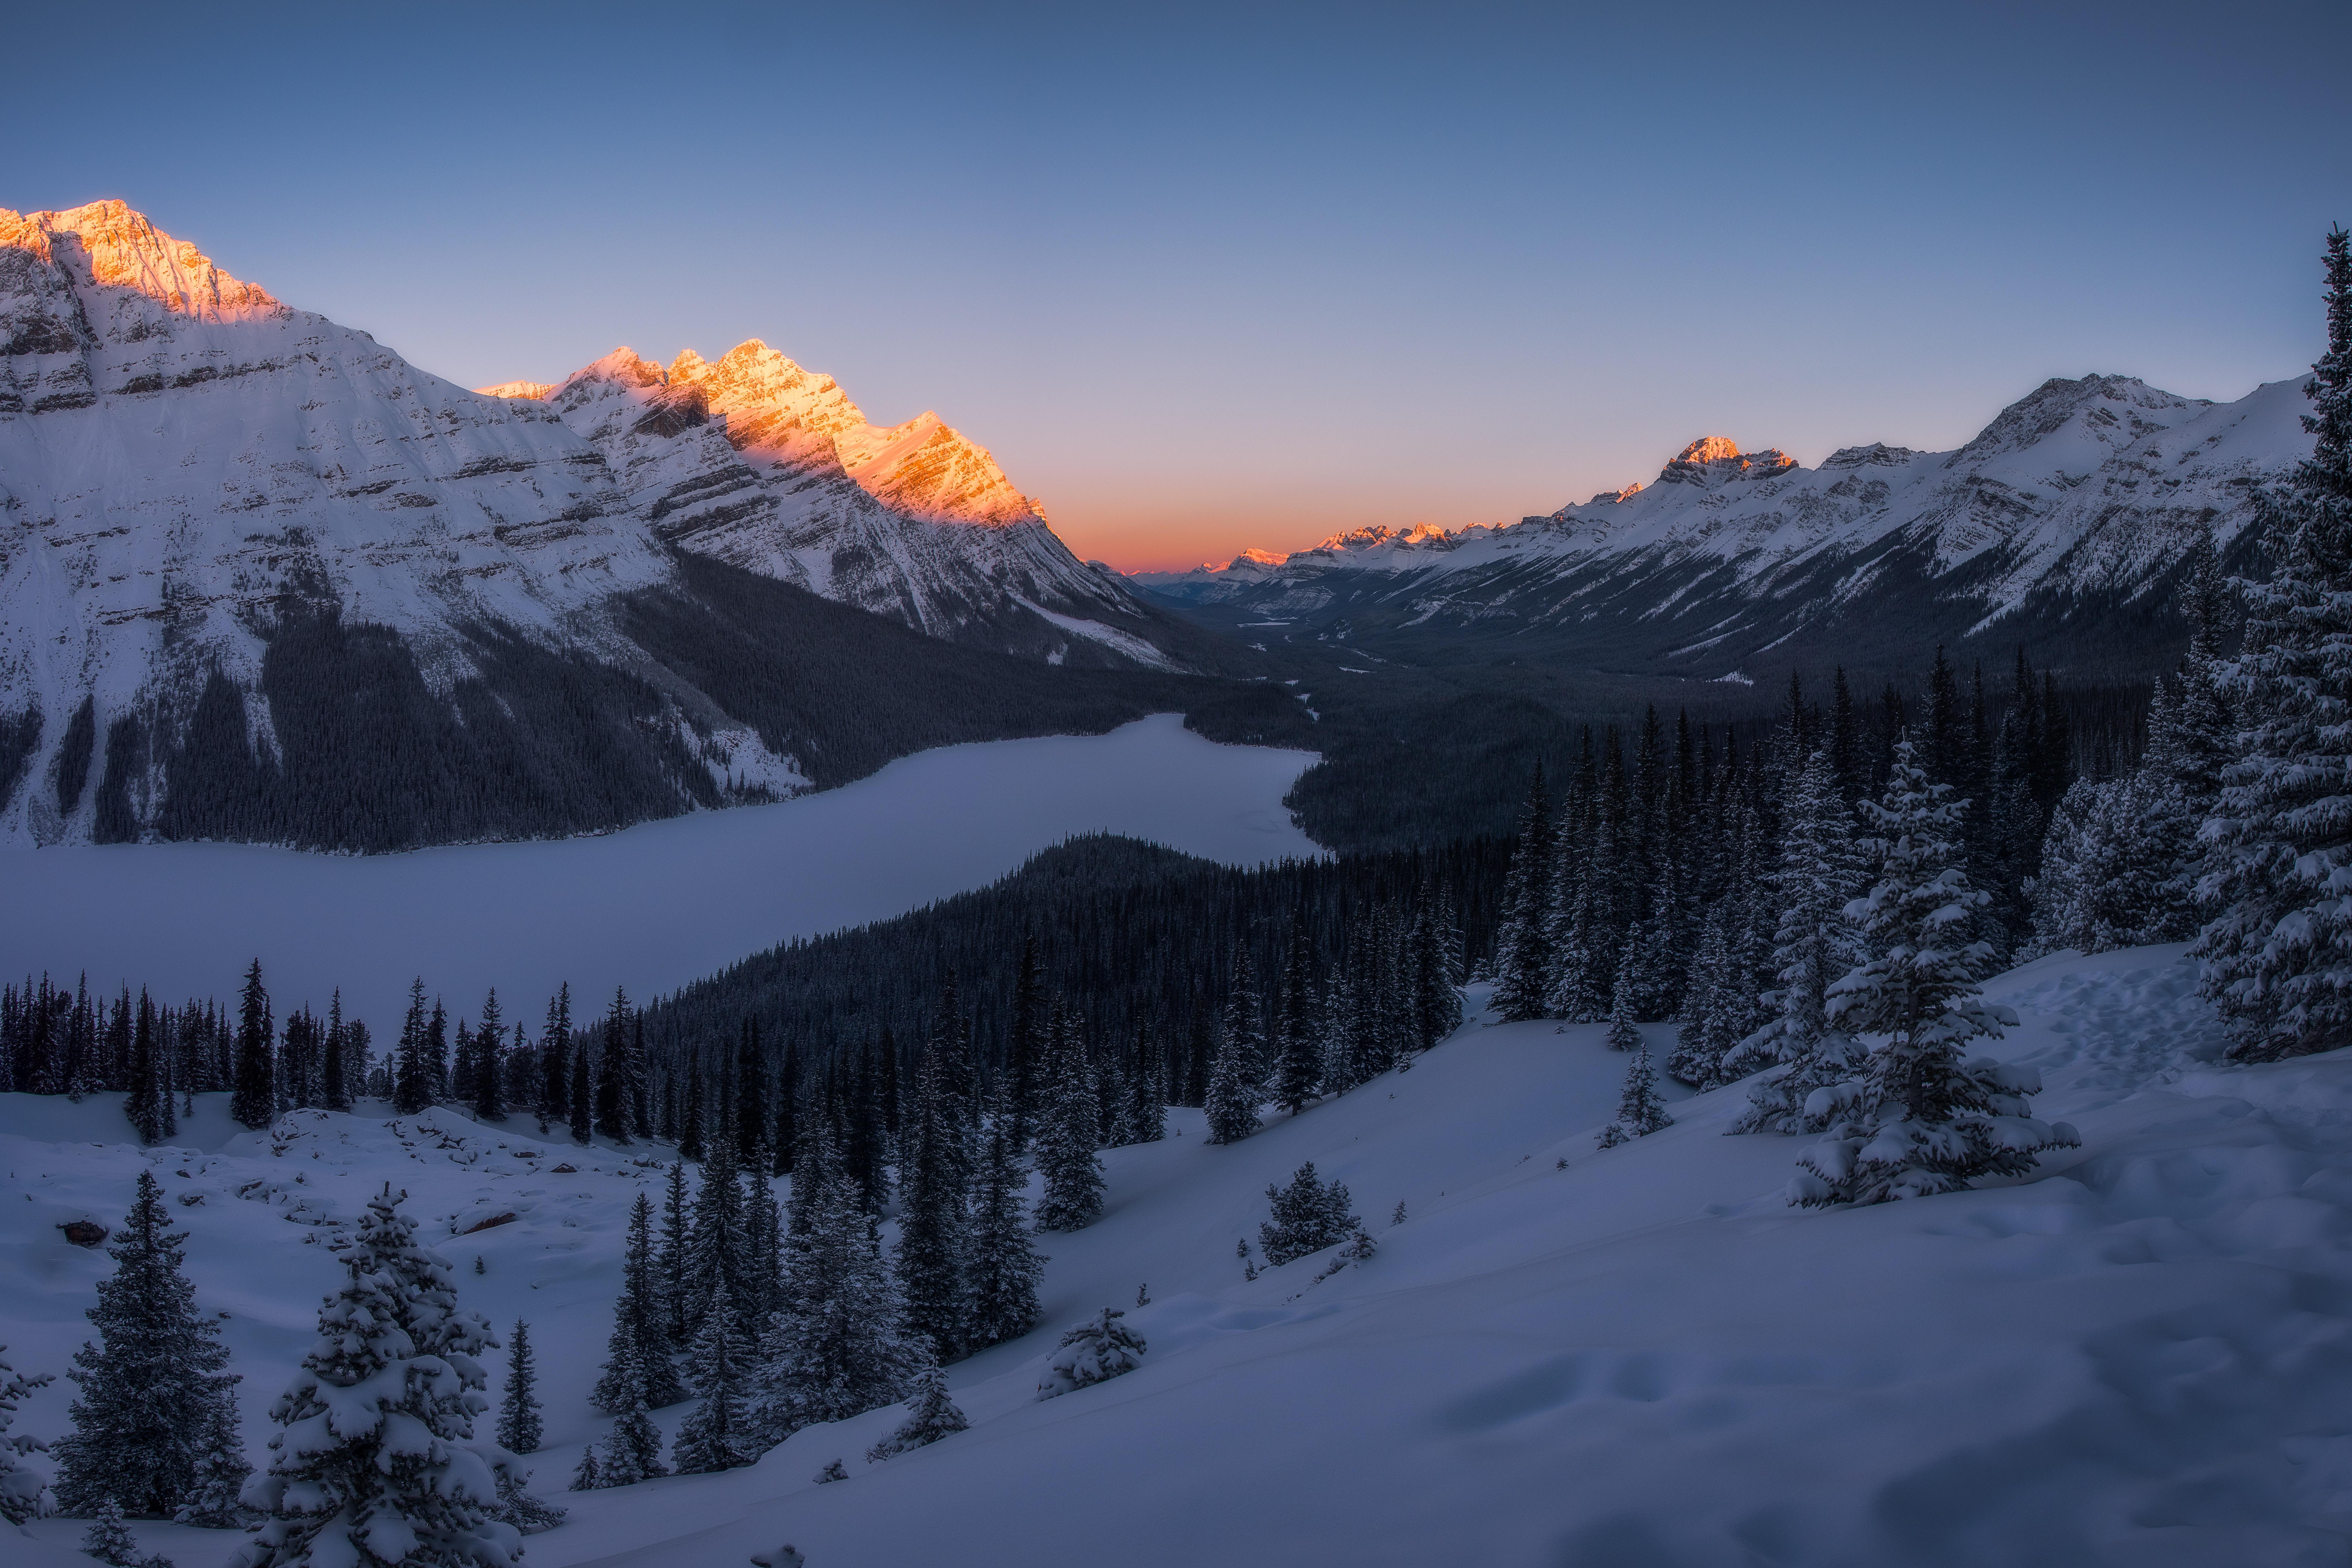 landscape shot of snowy mountain under blue sky